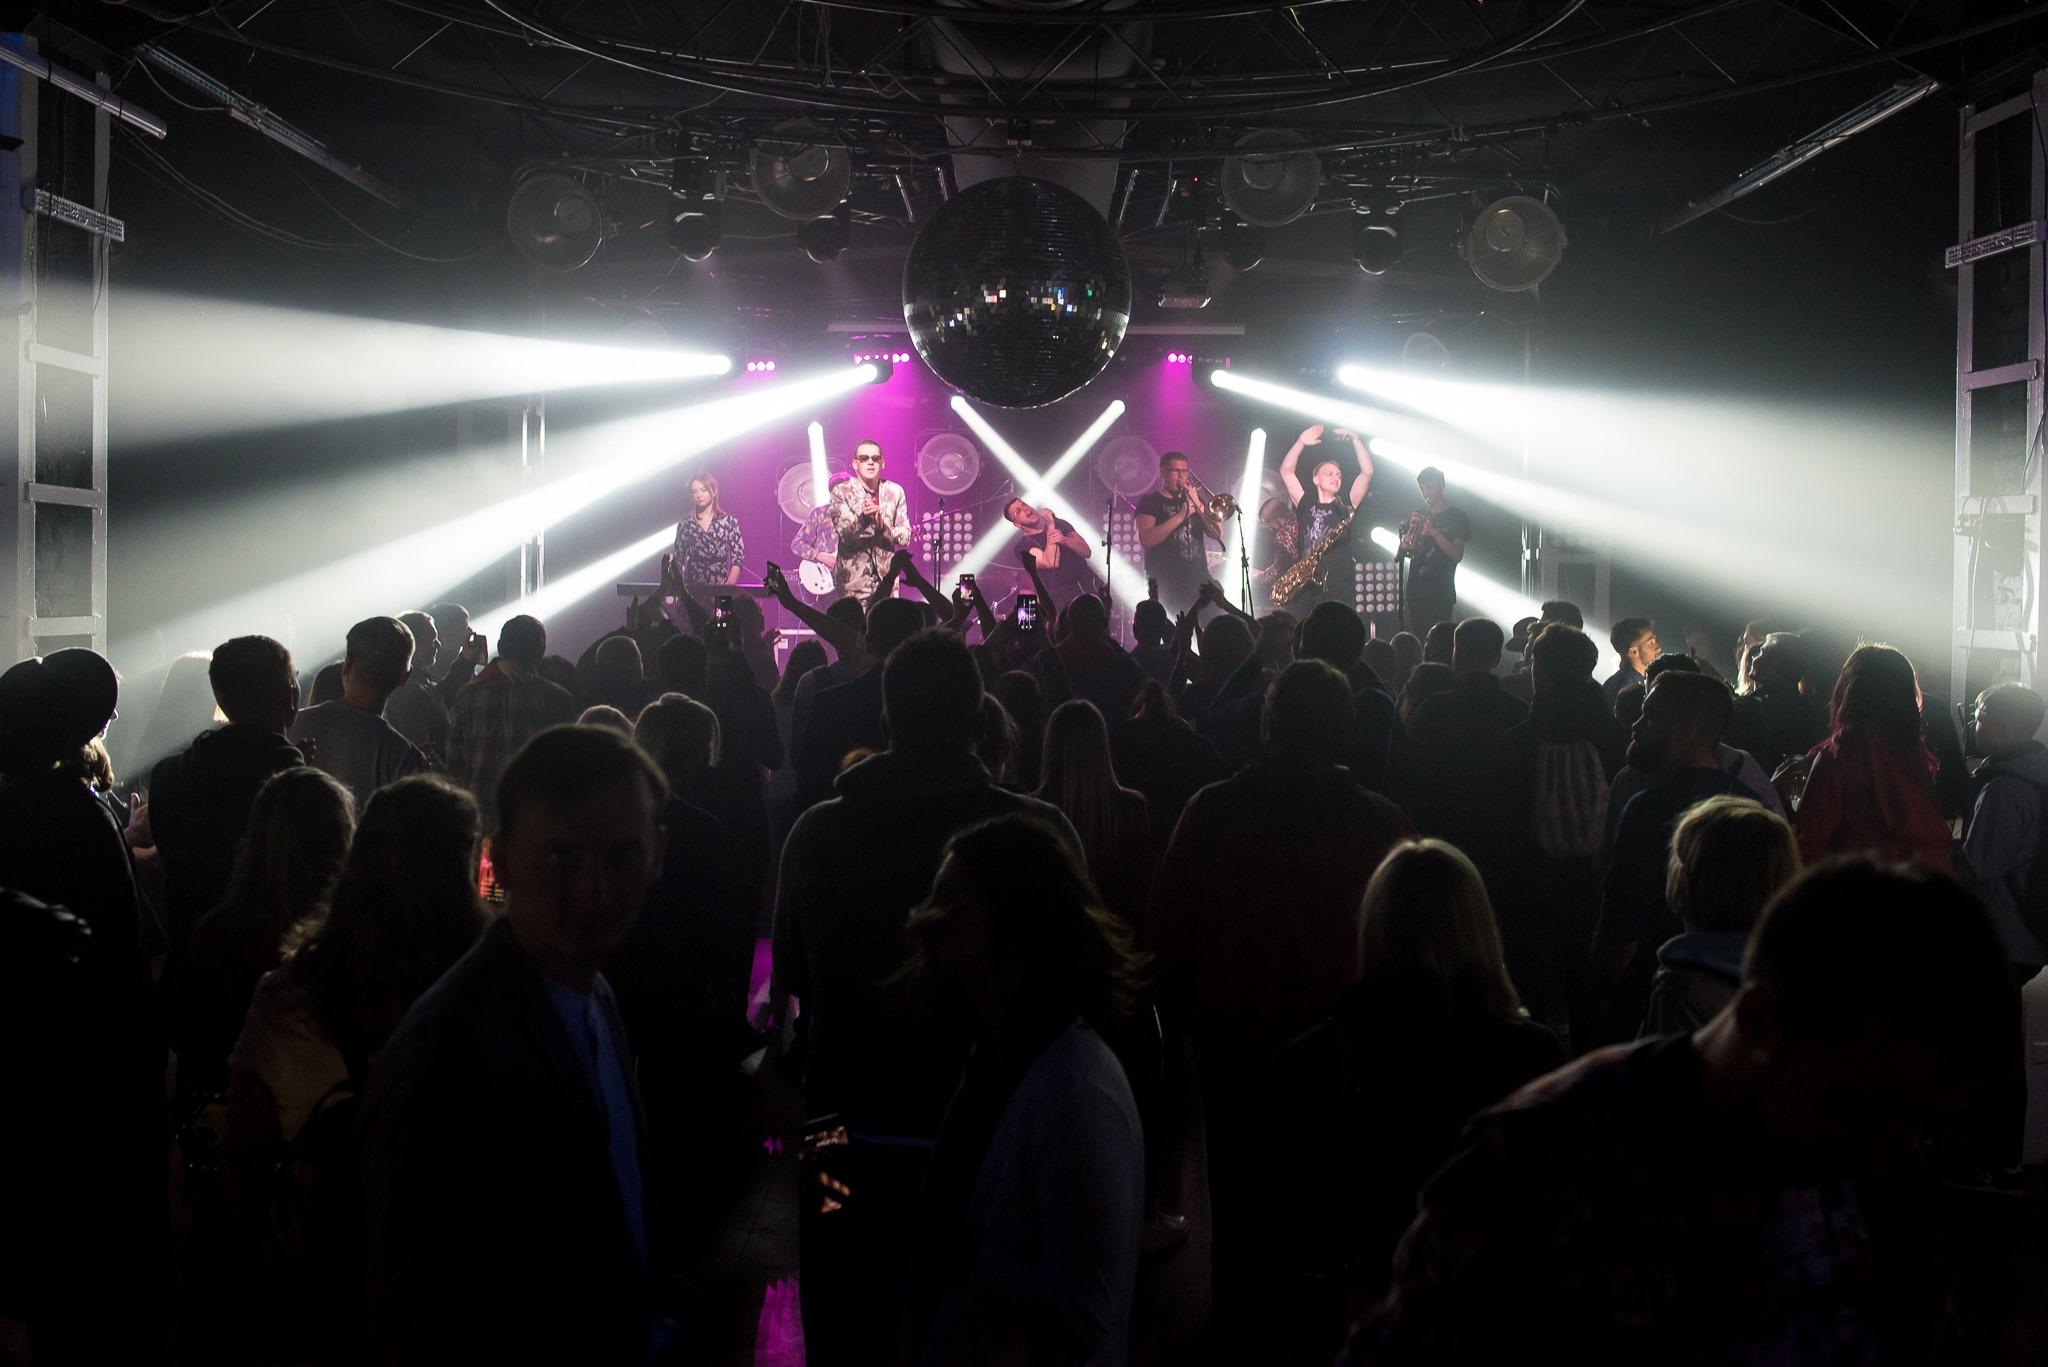 lvivdanceclub1 Lvivdanceclub — UA MUSIC | Енциклопедія української музики